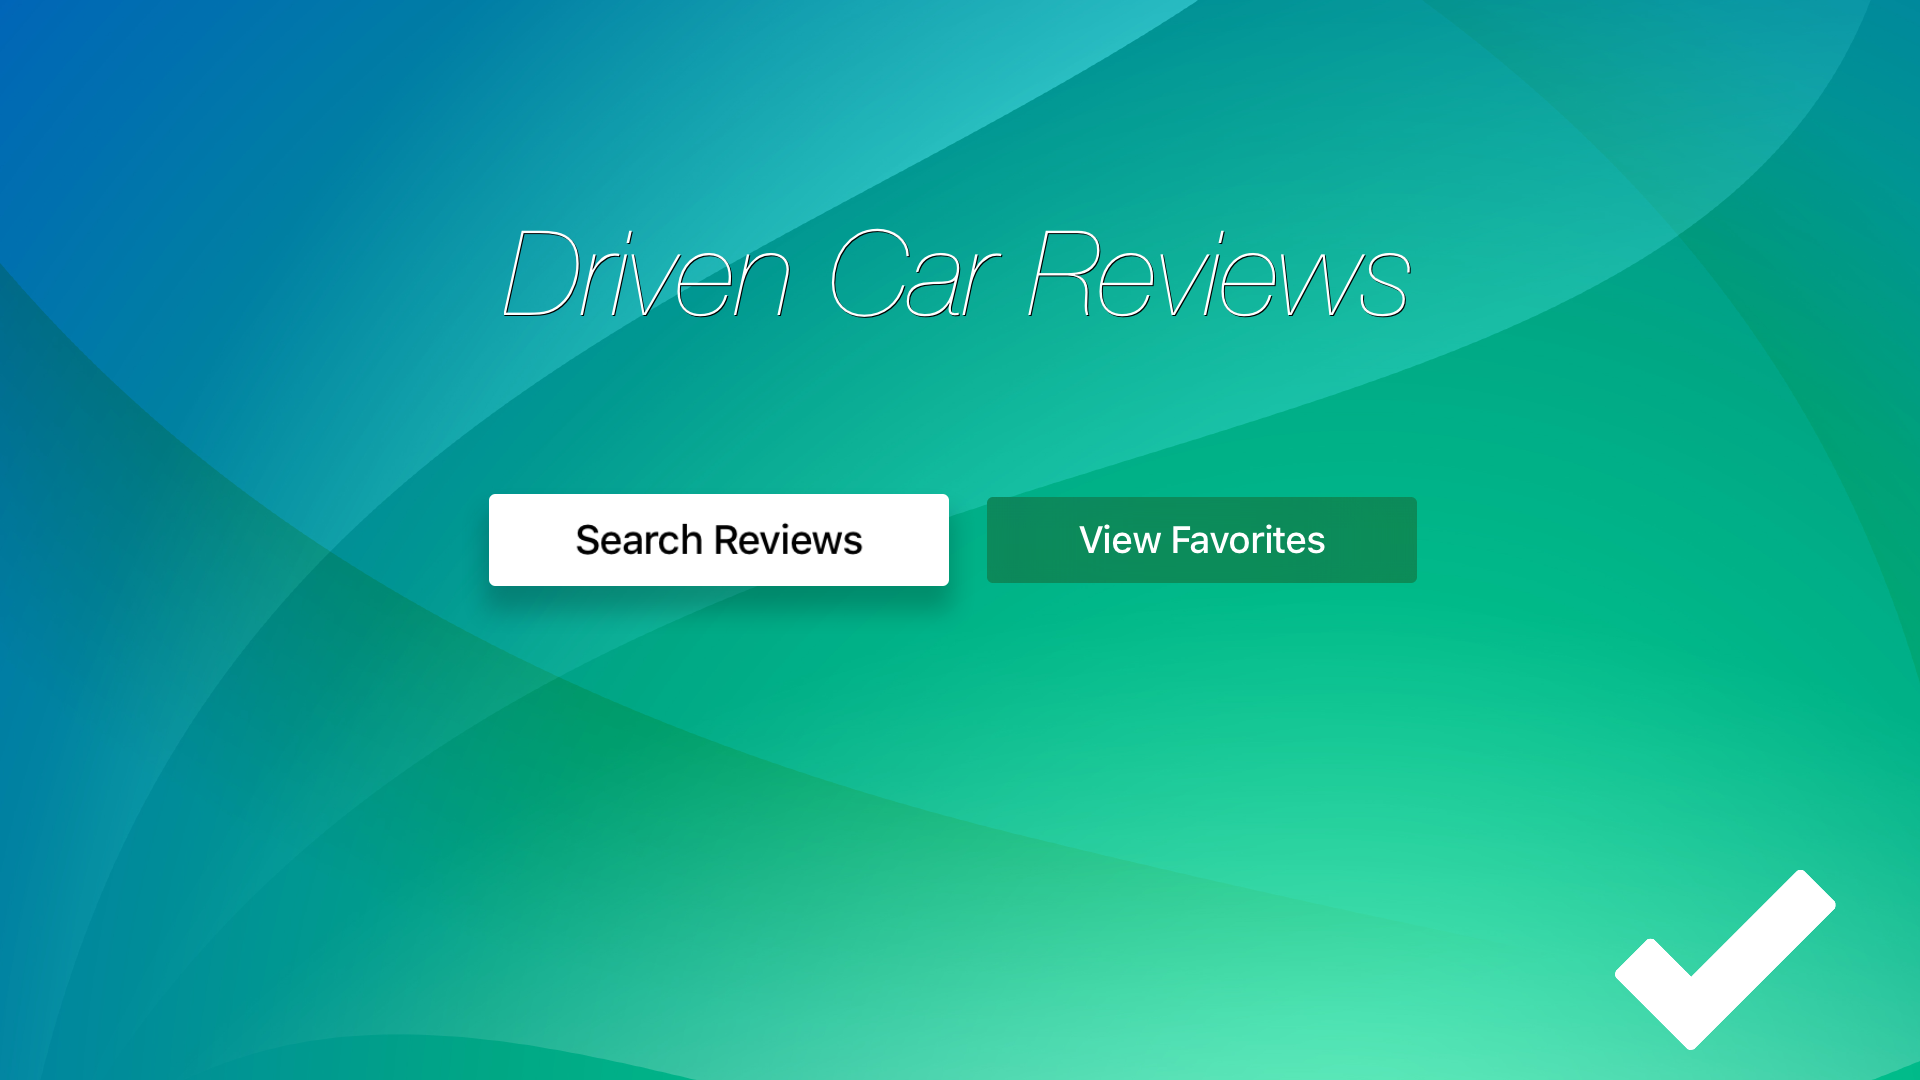 Driven TV - Car Reviews screenshot 4